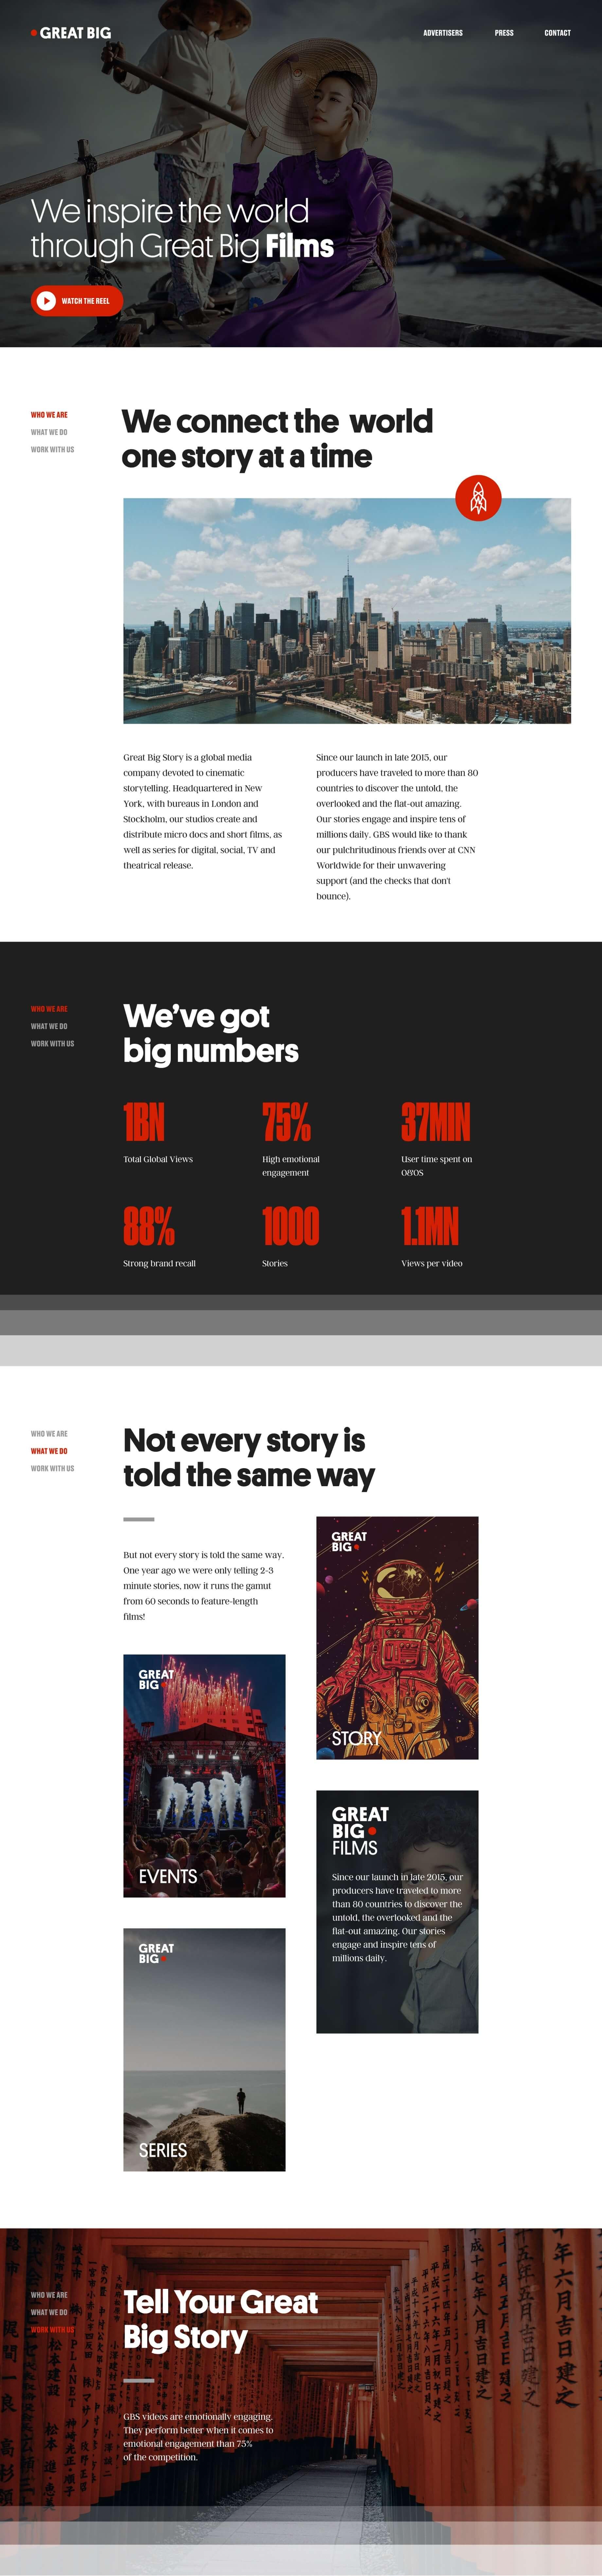 Great Big Story product design image desktop